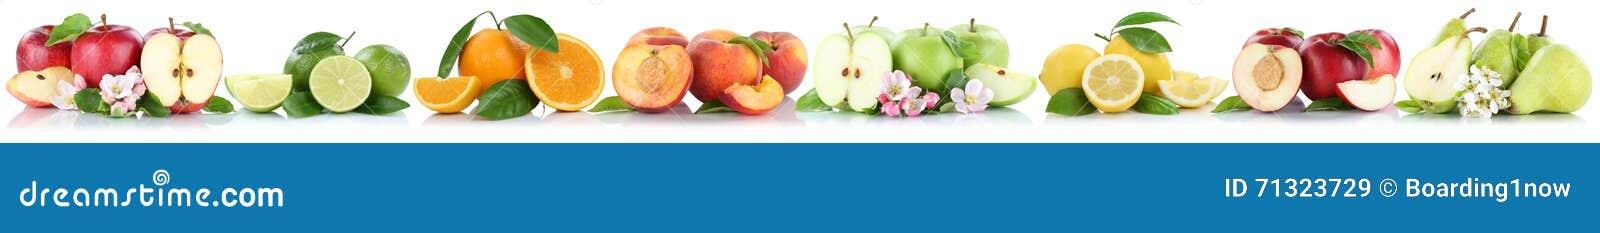 Fruits apple orange lemon nectarine apples oranges fruit in a row isolated on white